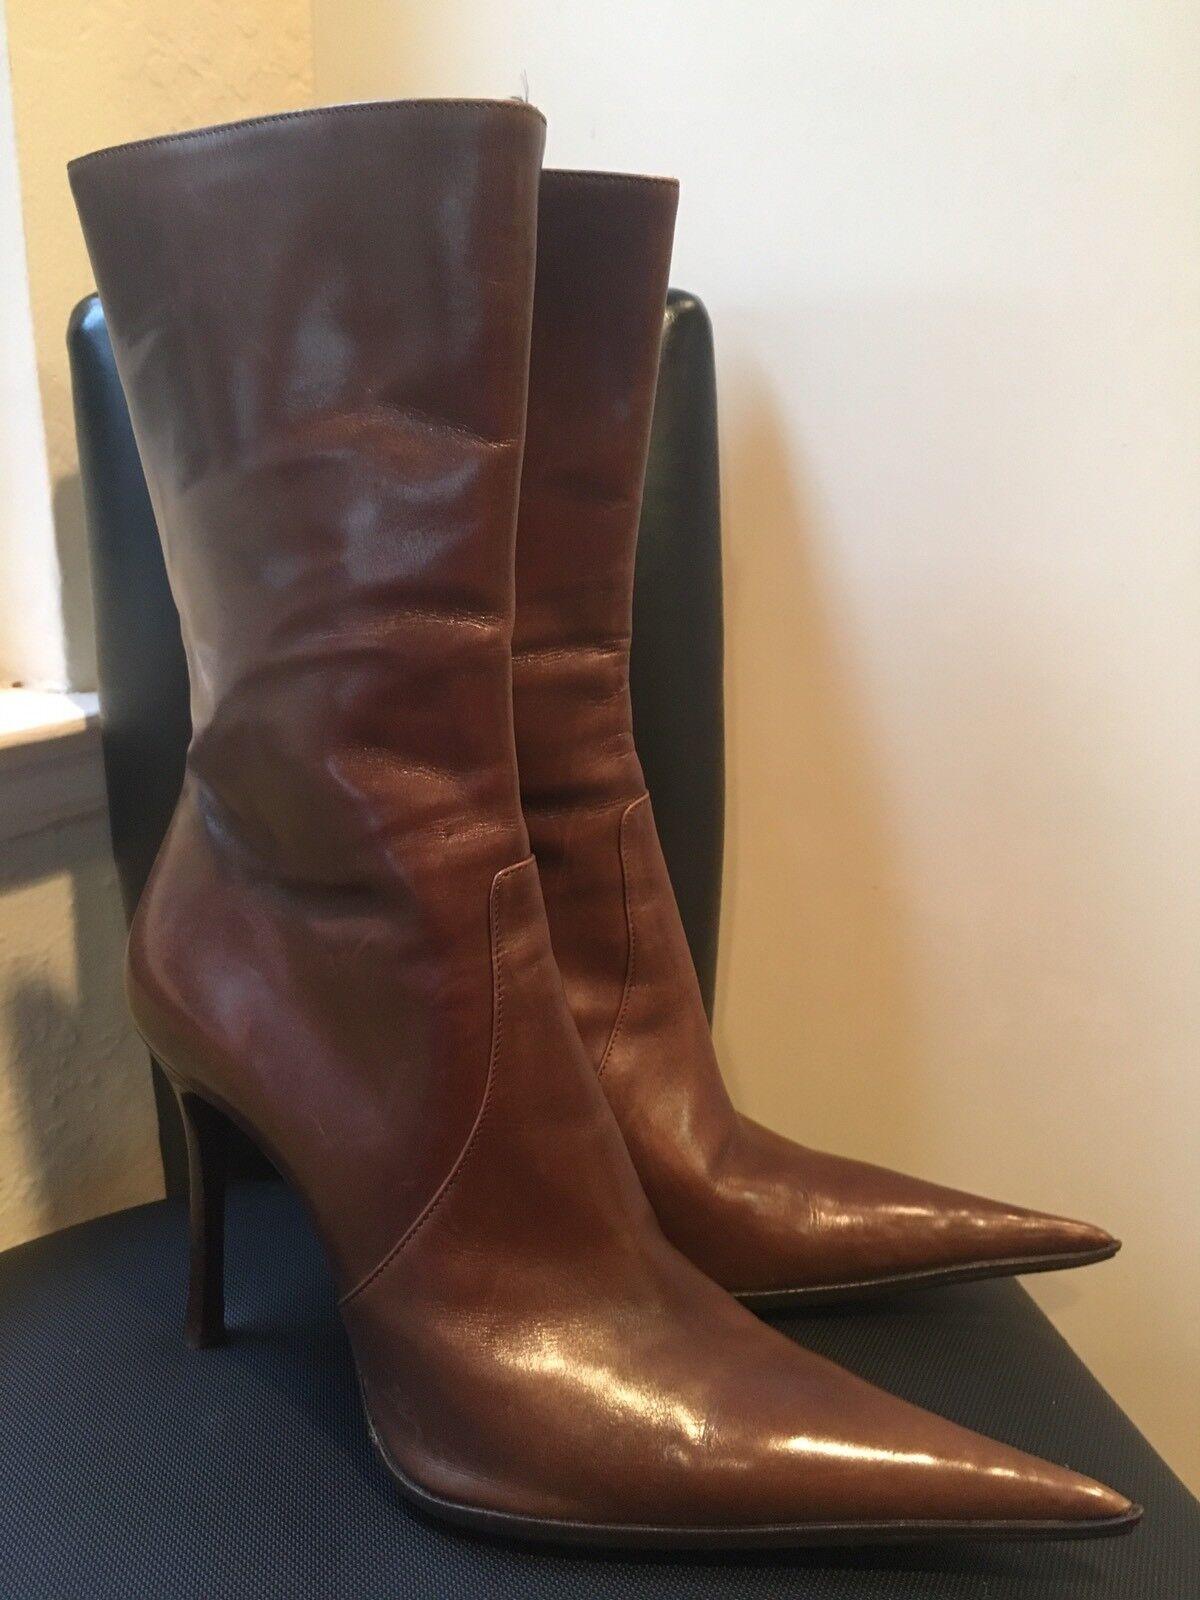 Icone Braun Leder Ankle Stiletto Heels Pointy Toes Ankle Stiefel M Größe 7 M Stiefel 580c2b